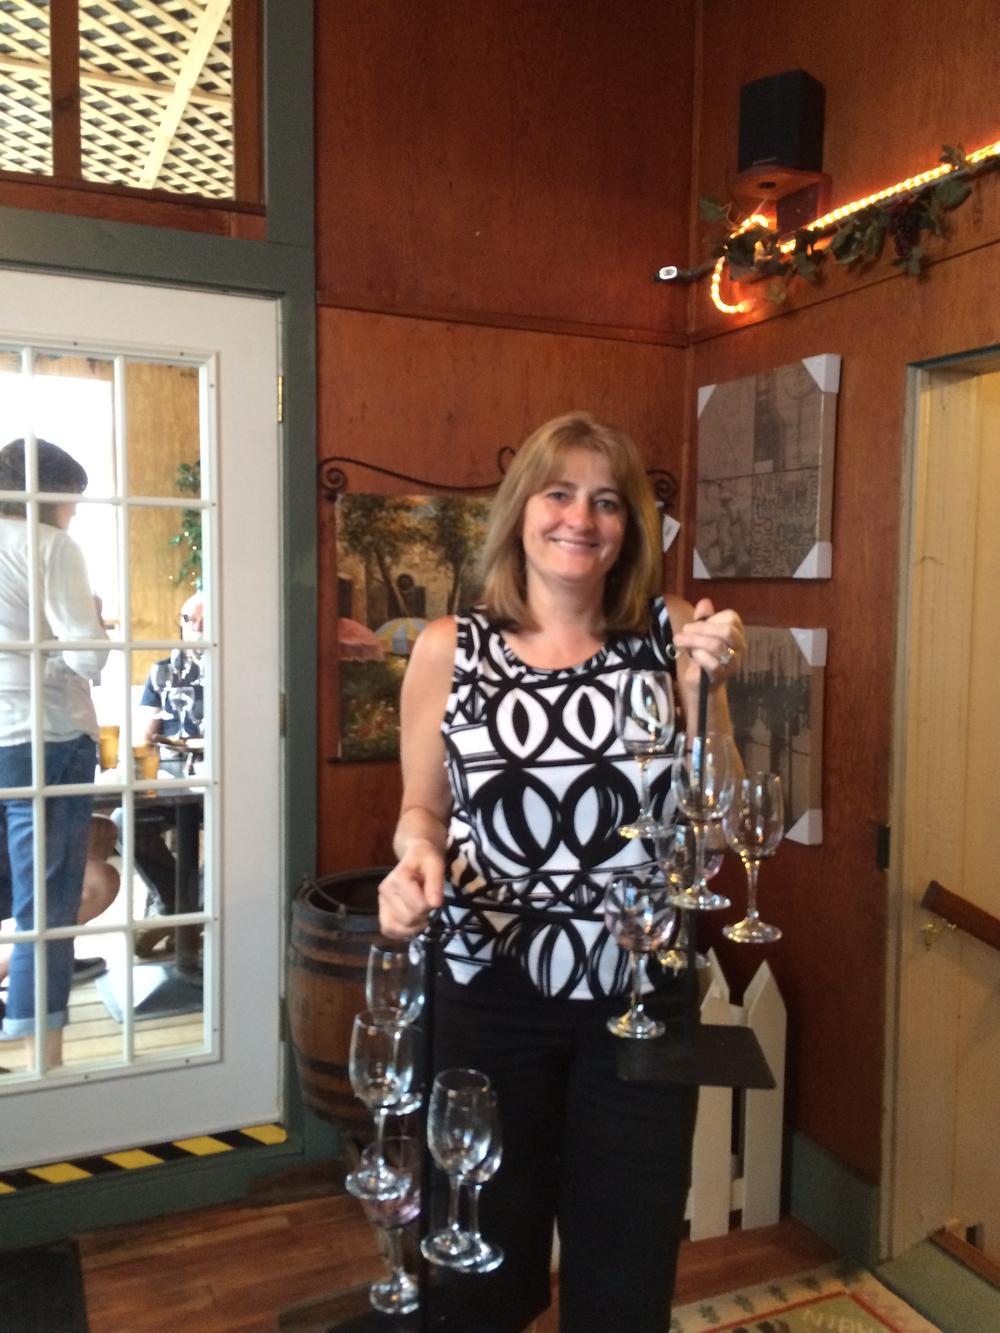 Patti Mehm, holding two (empty) wine flights